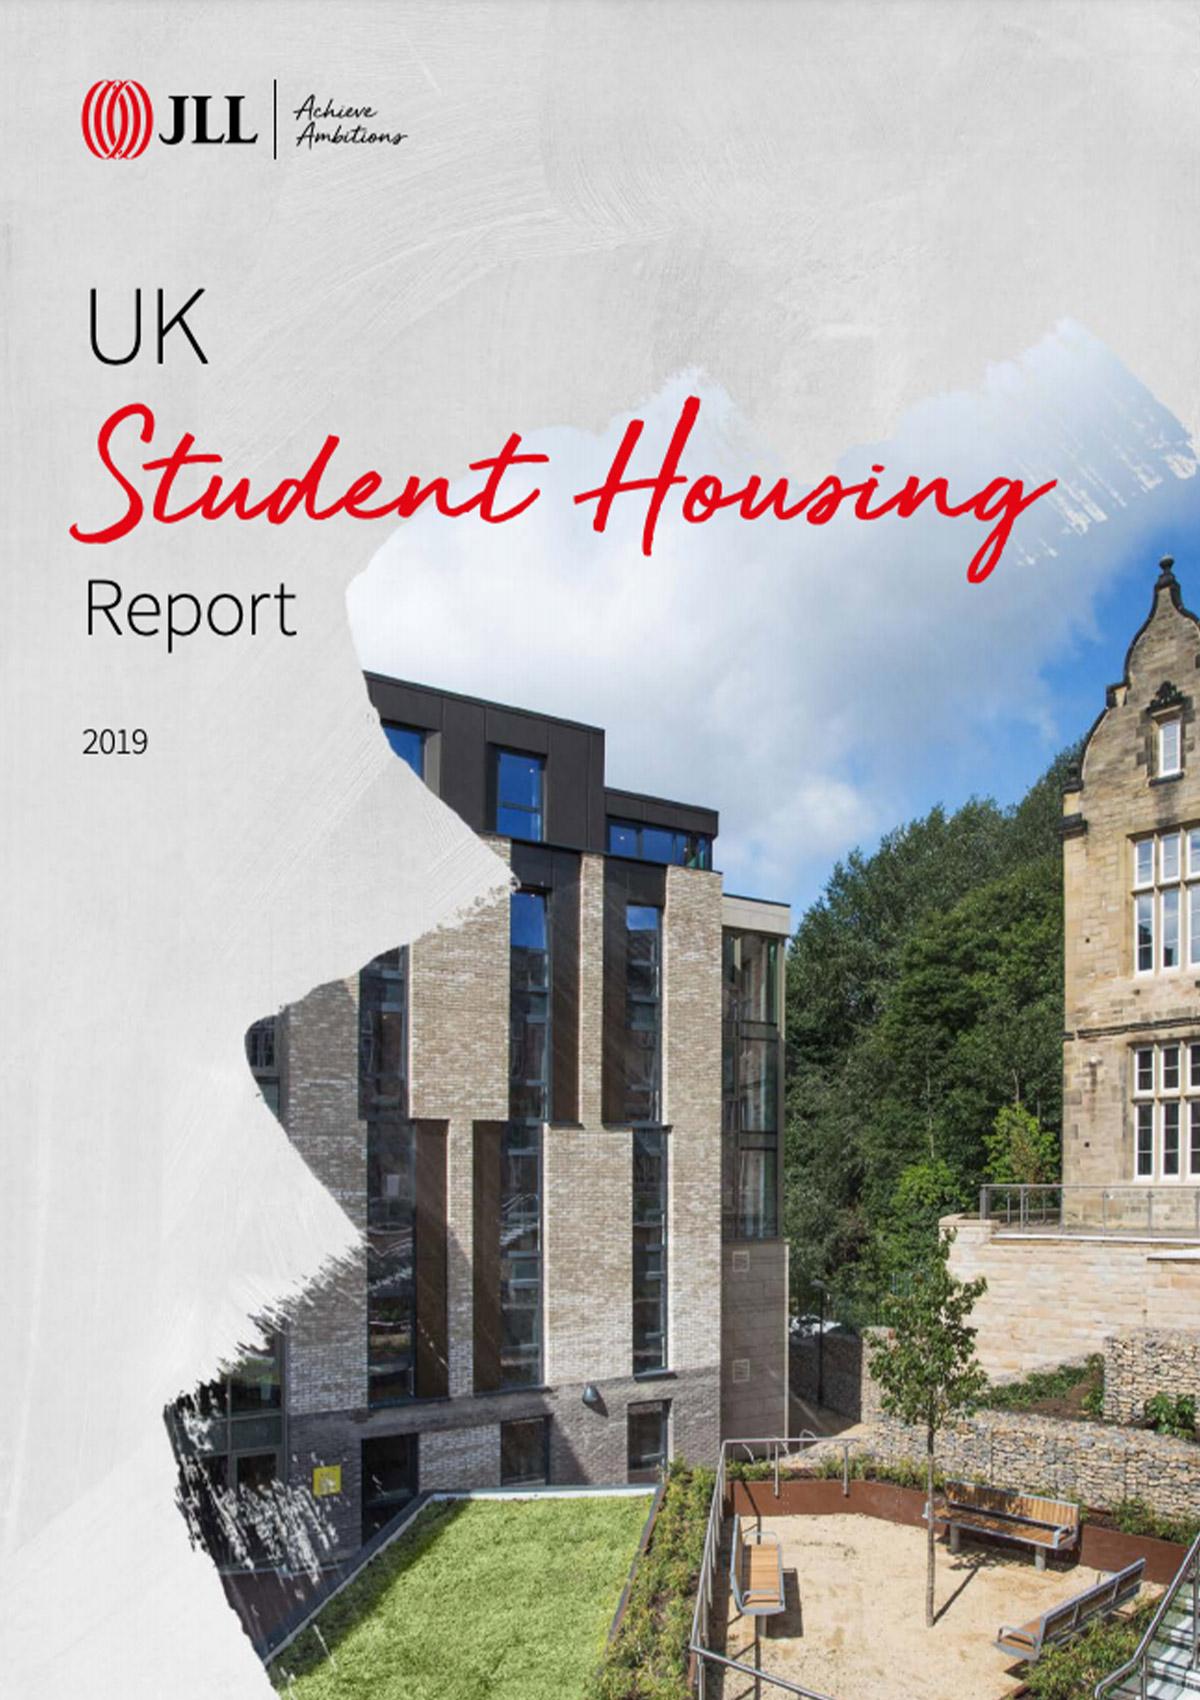 UK Student Housing Report